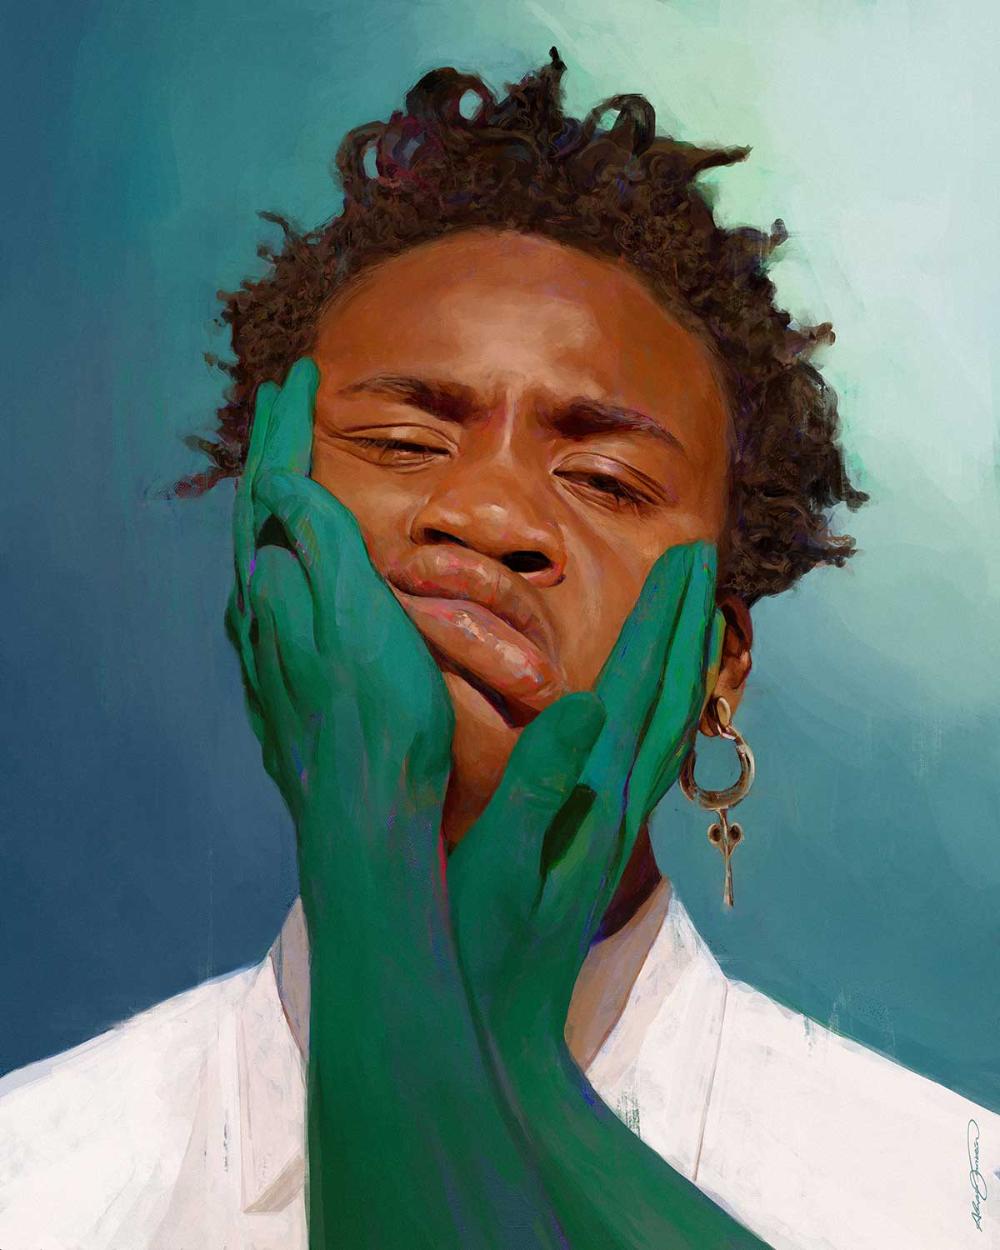 Digital Paintings von Alexis Franklin